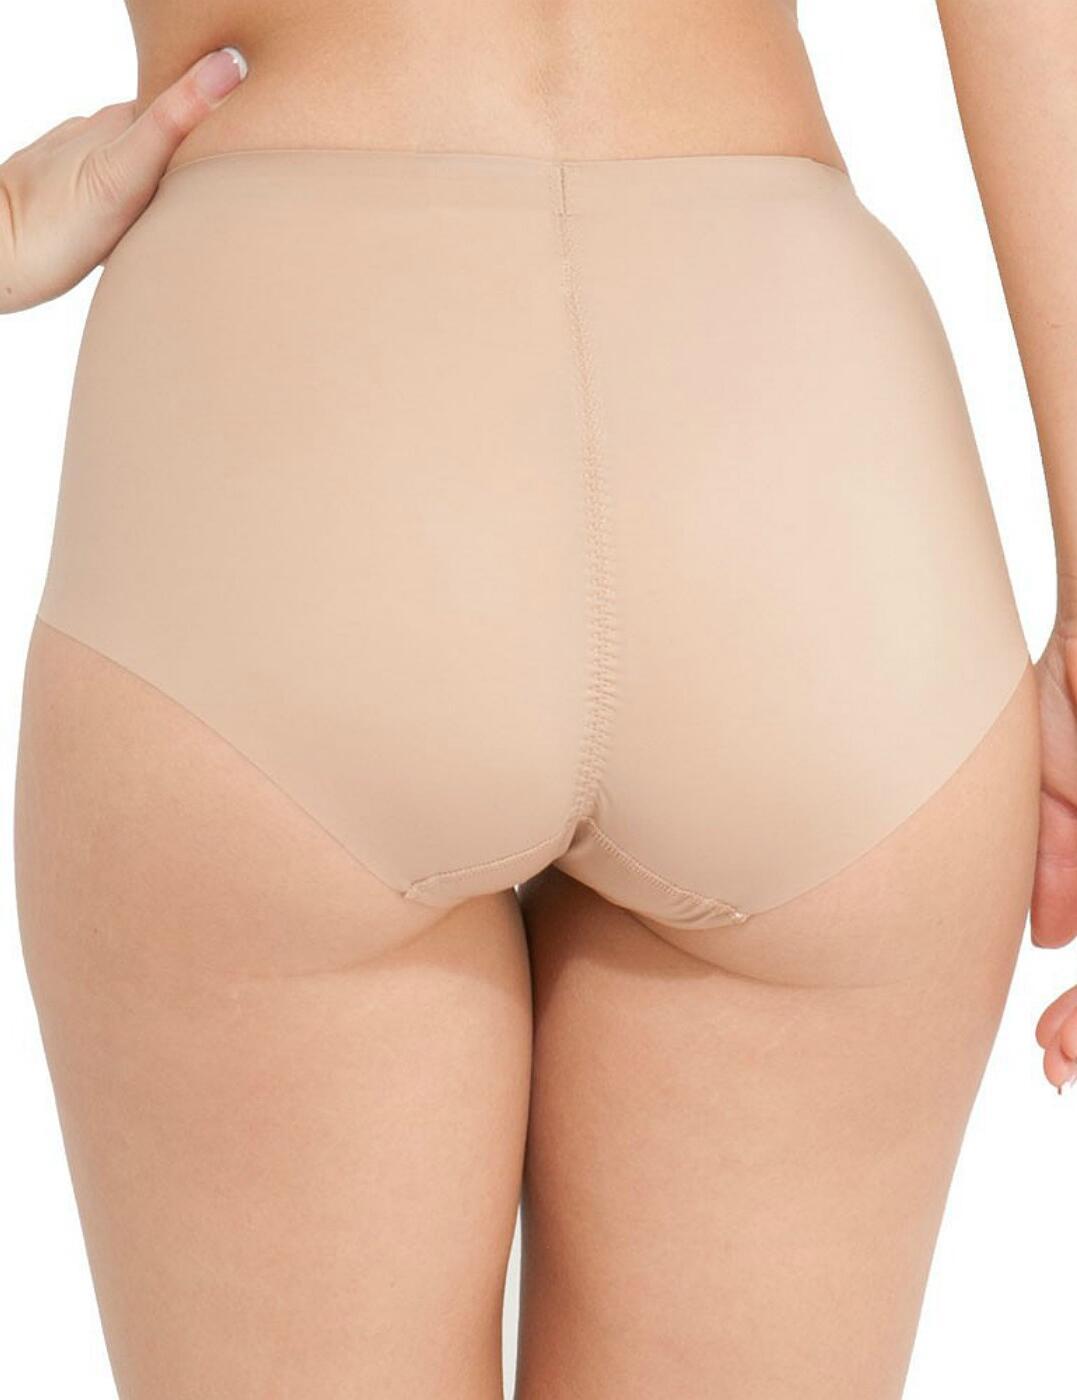 Wacoal Beauty Secret Lift Up Shaping Brief Knickers Pant GRA441 Wacoal Shapewear